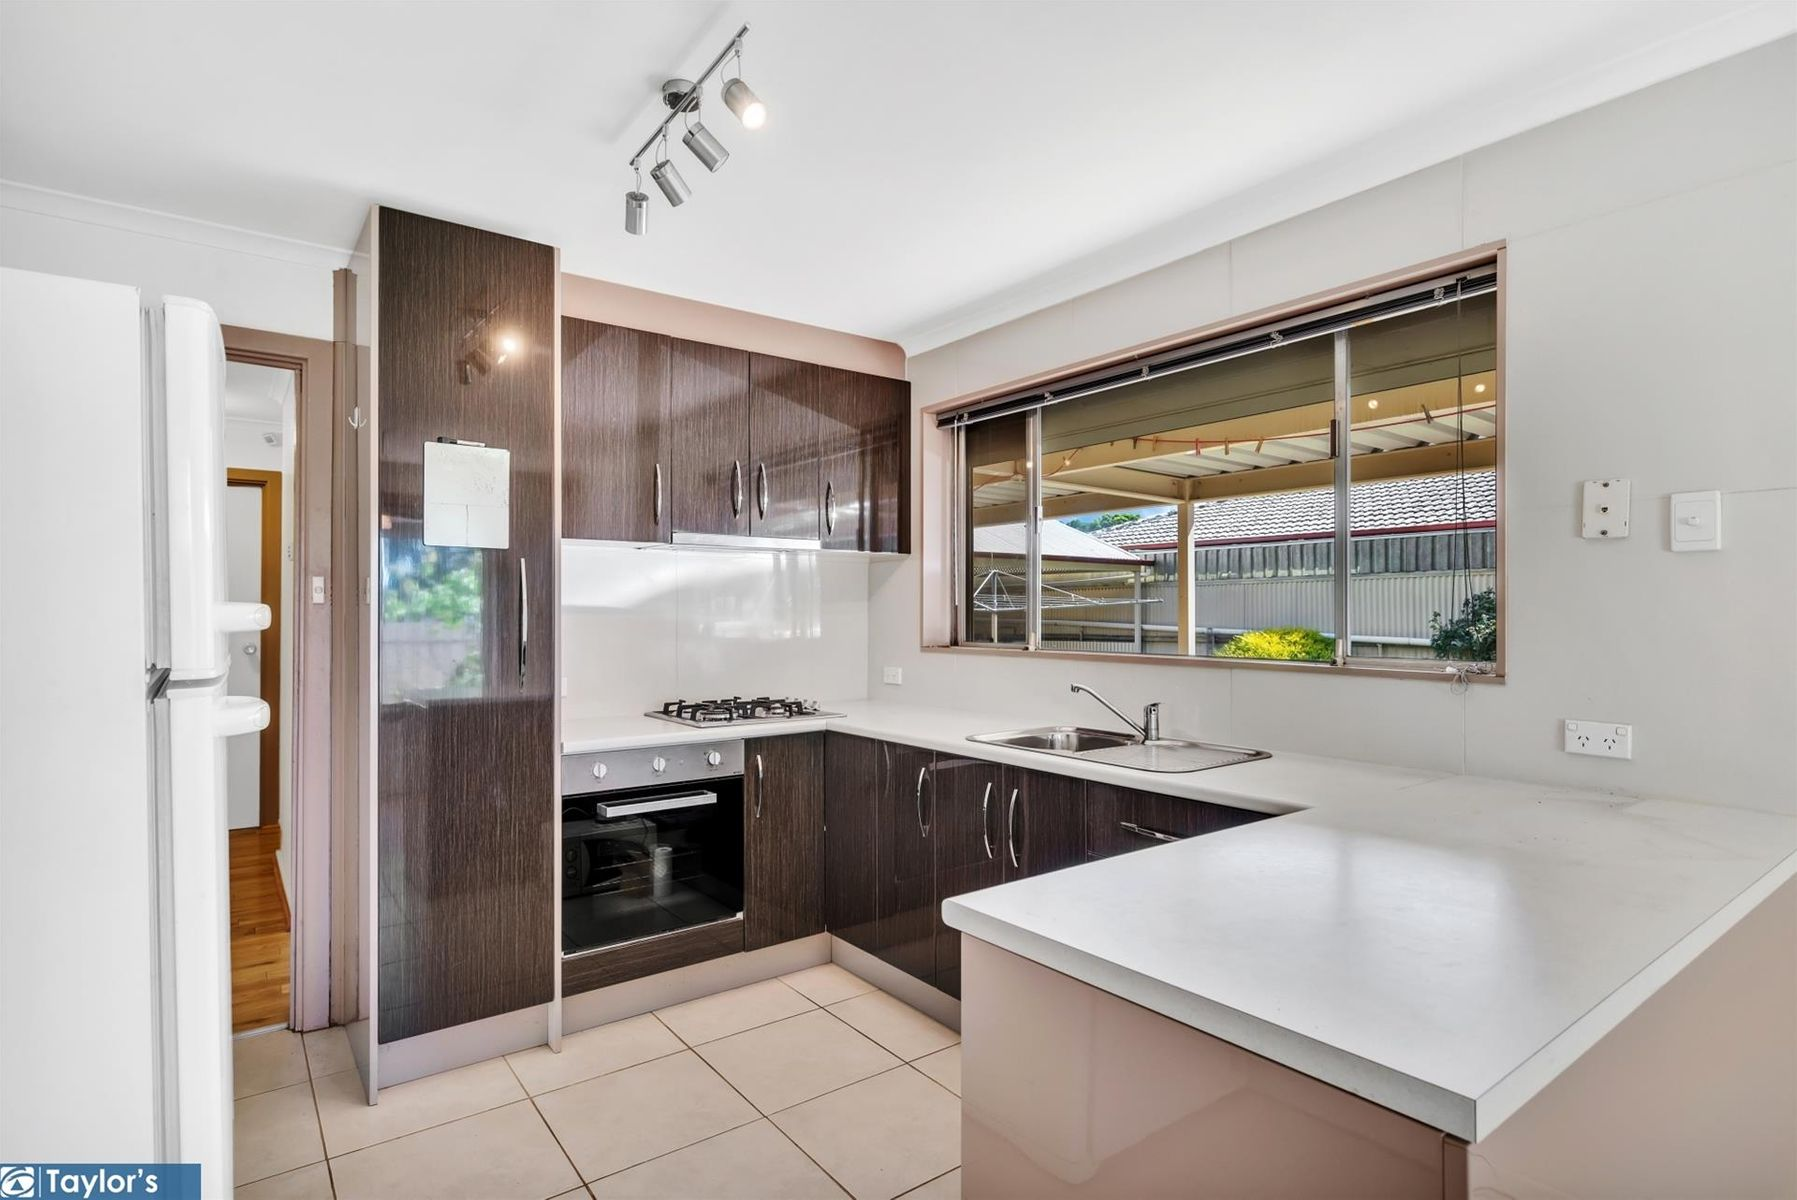 175 Whites Road, Paralowie, SA 5108